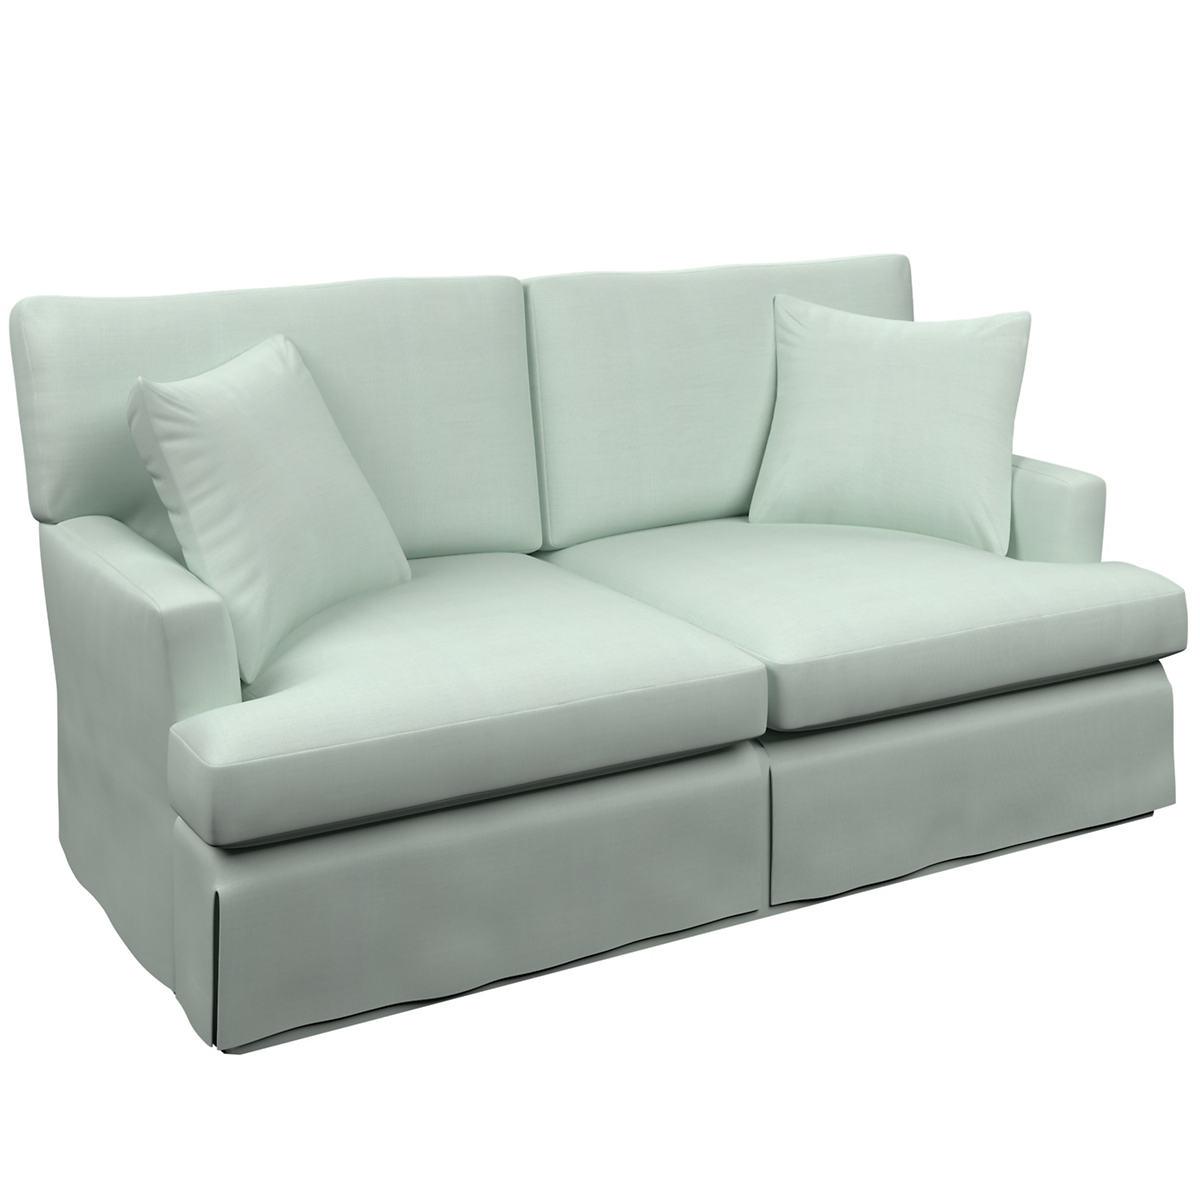 Estate Linen Powder Blue Saybrook 2 Seater Slipcovered Sofa